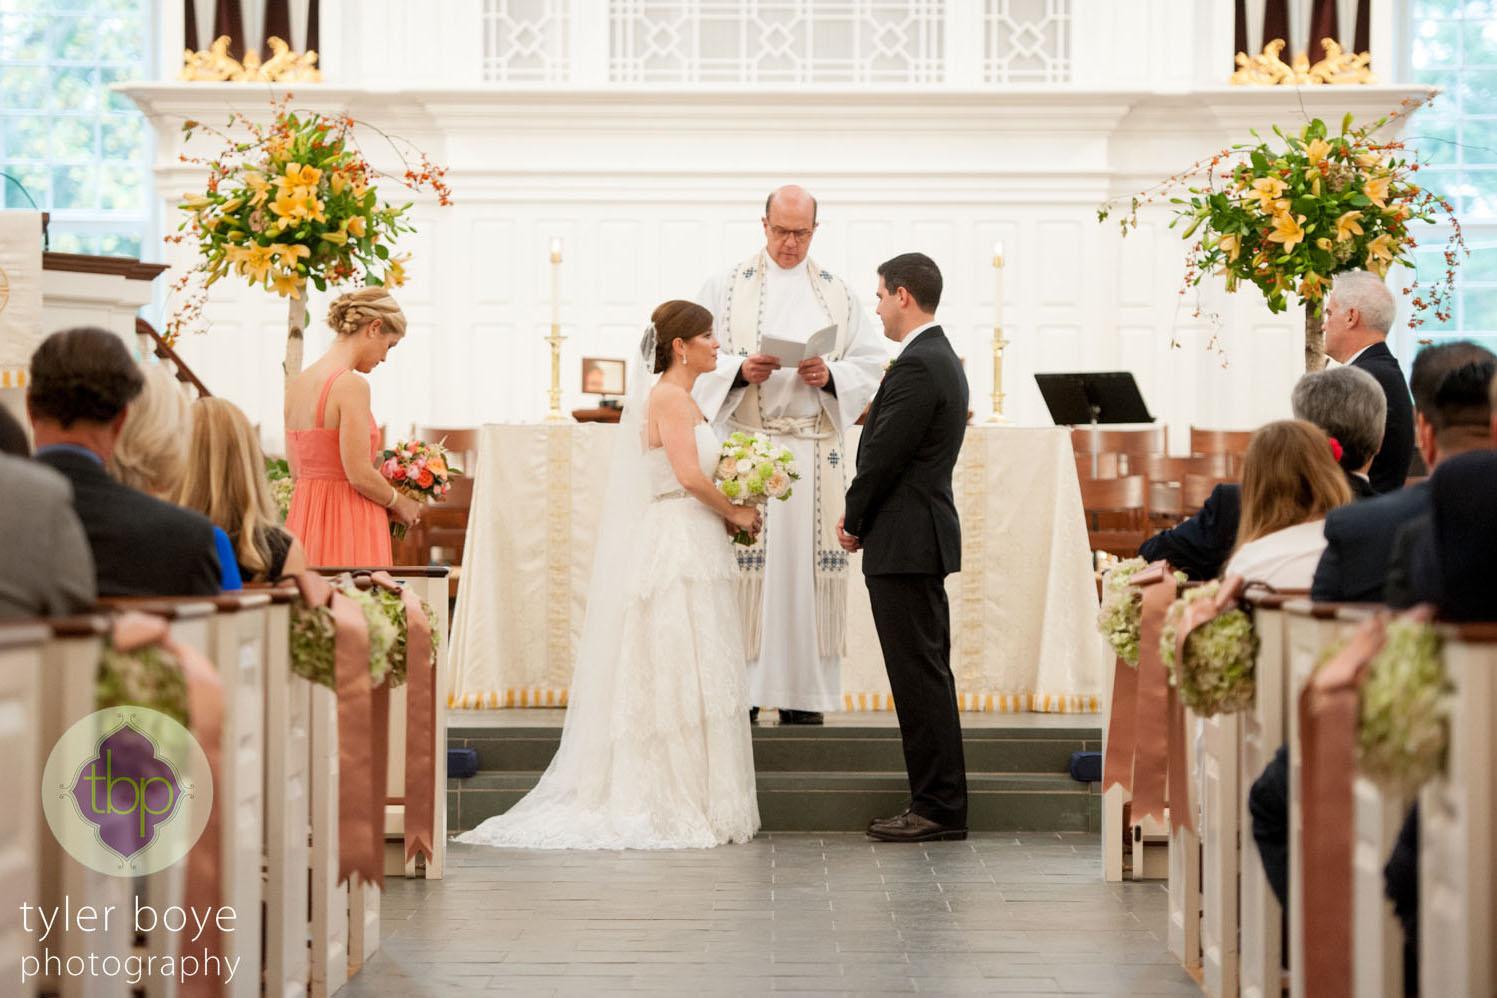 Tyler Boye Photography  | Wedding Ceremony | Saint David's Church, Wayne, PA